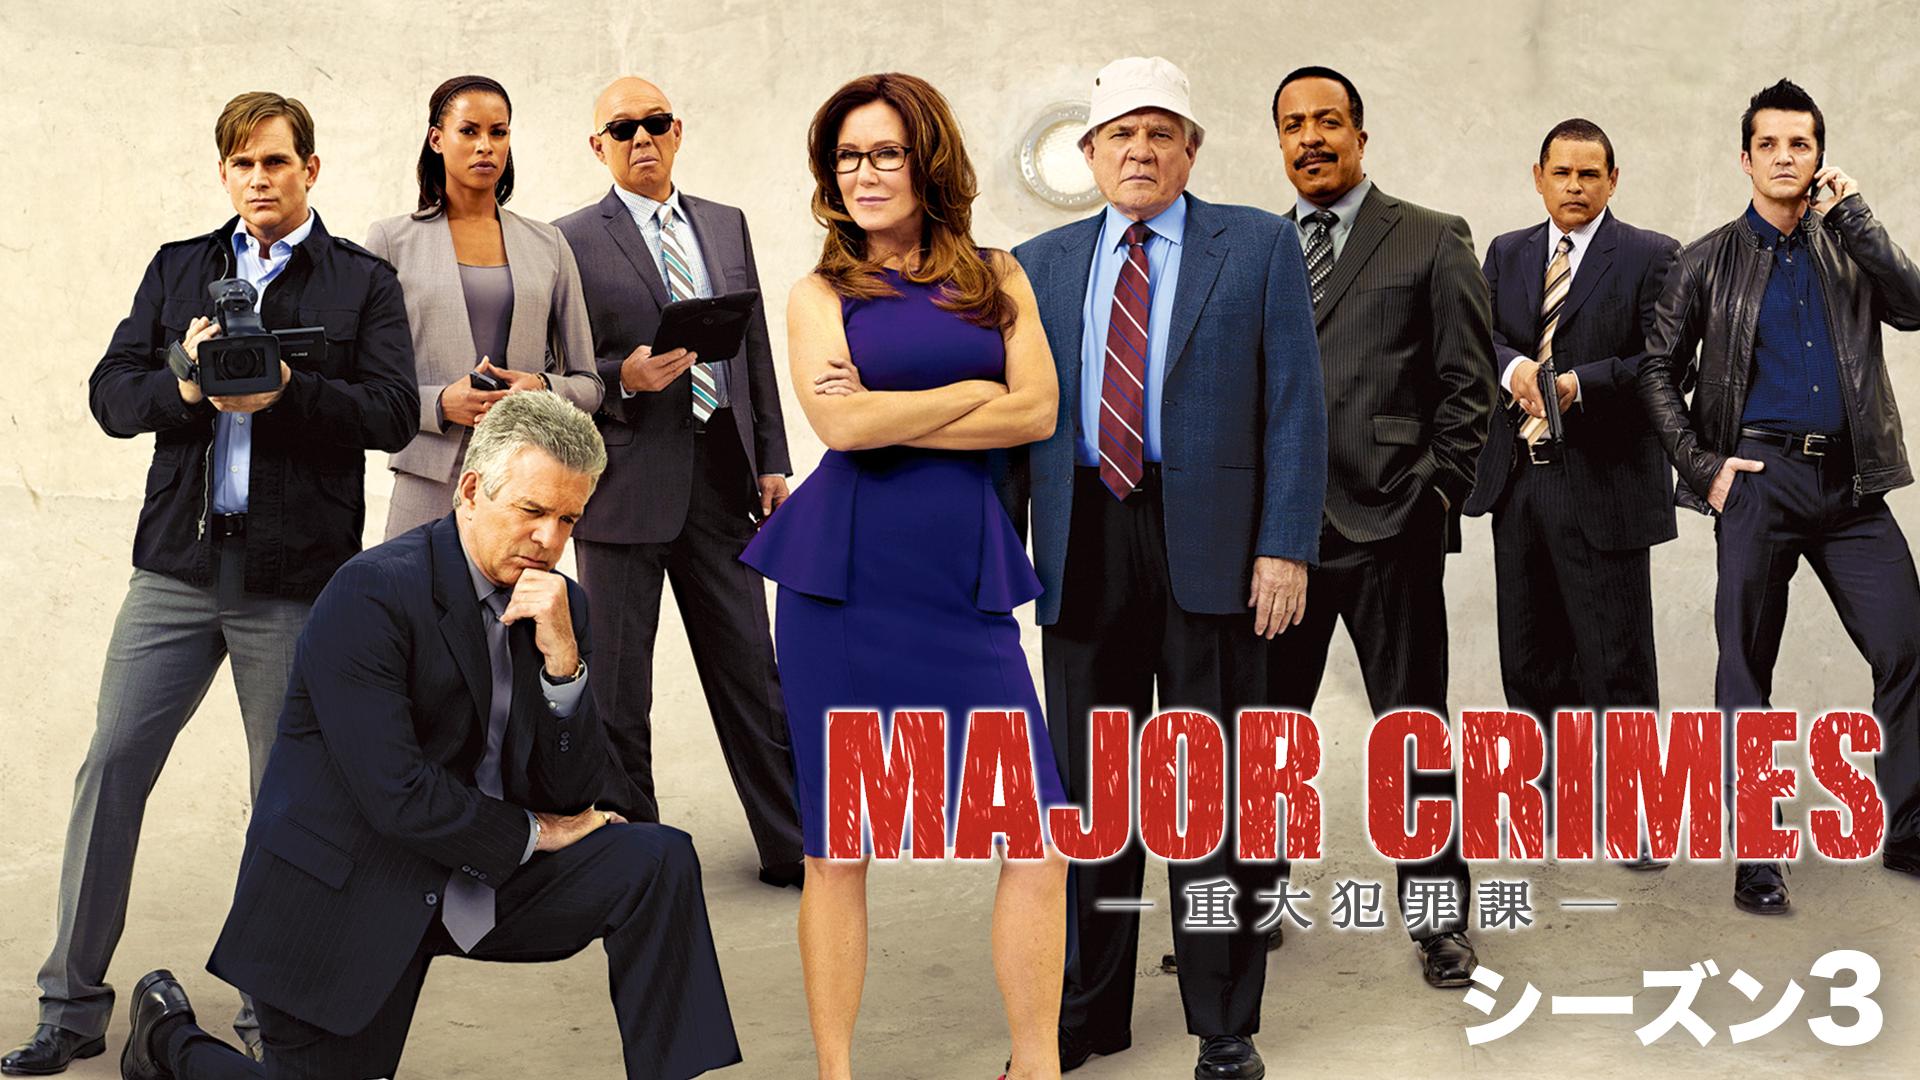 MAJOR CRIMES ~重大犯罪課 シーズン3の動画 - MAJOR CRIMES ~重大犯罪課 シーズン1